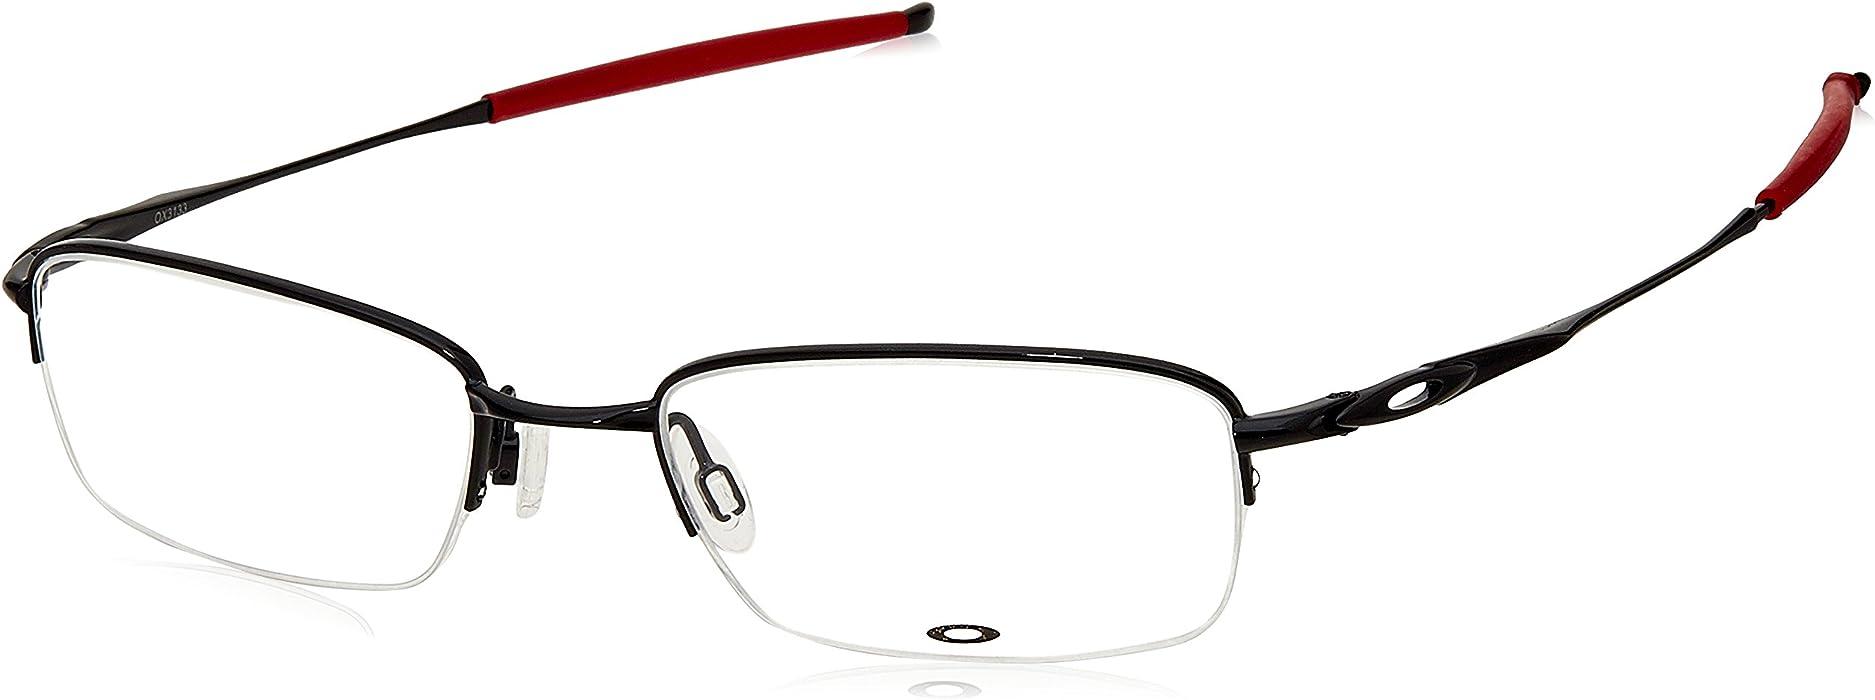 eafaaf99b4 Prescription Eyeglasses OX3133 - 0753 - Polished Black Red. Back.  Double-tap to zoom